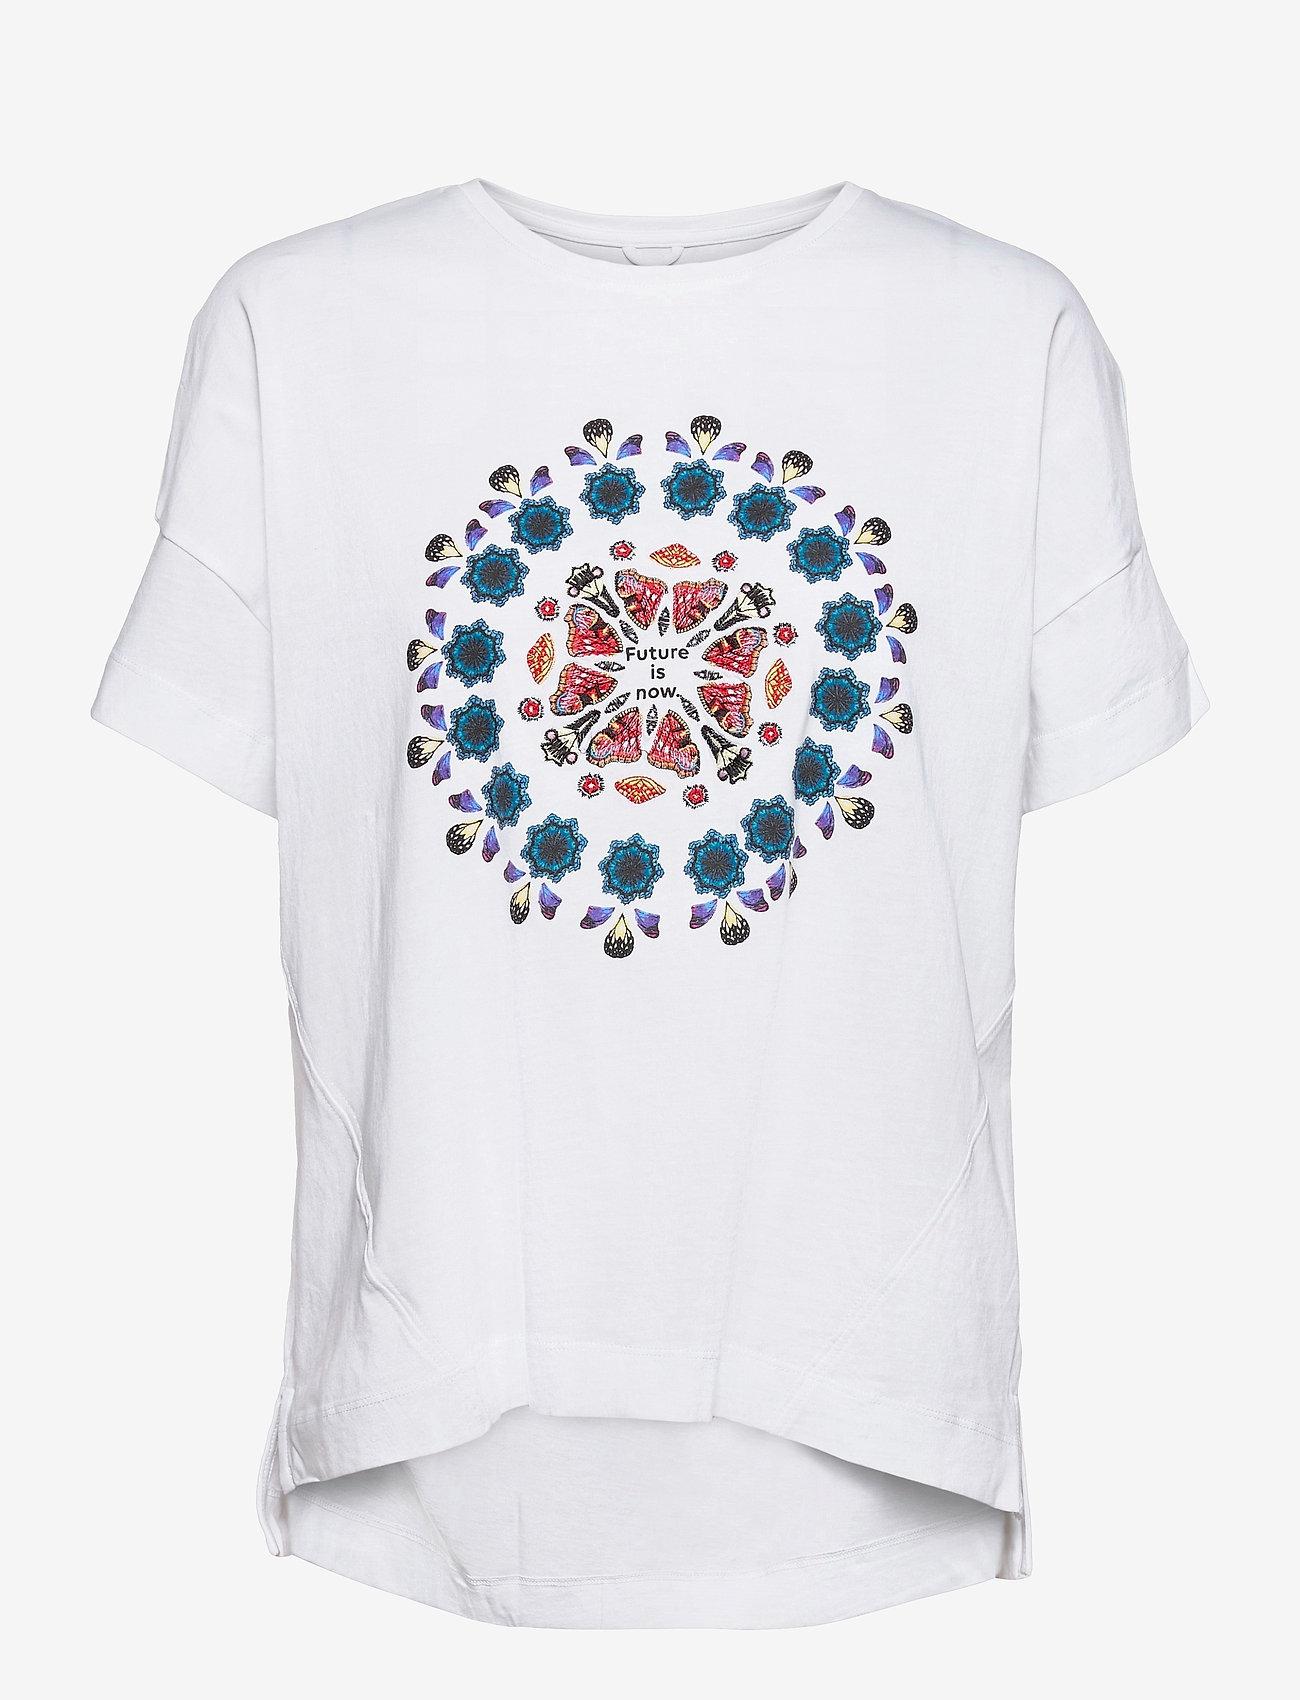 Desigual - T SHIRT OVERSIZE GALACTI - t-shirts - blanco - 0